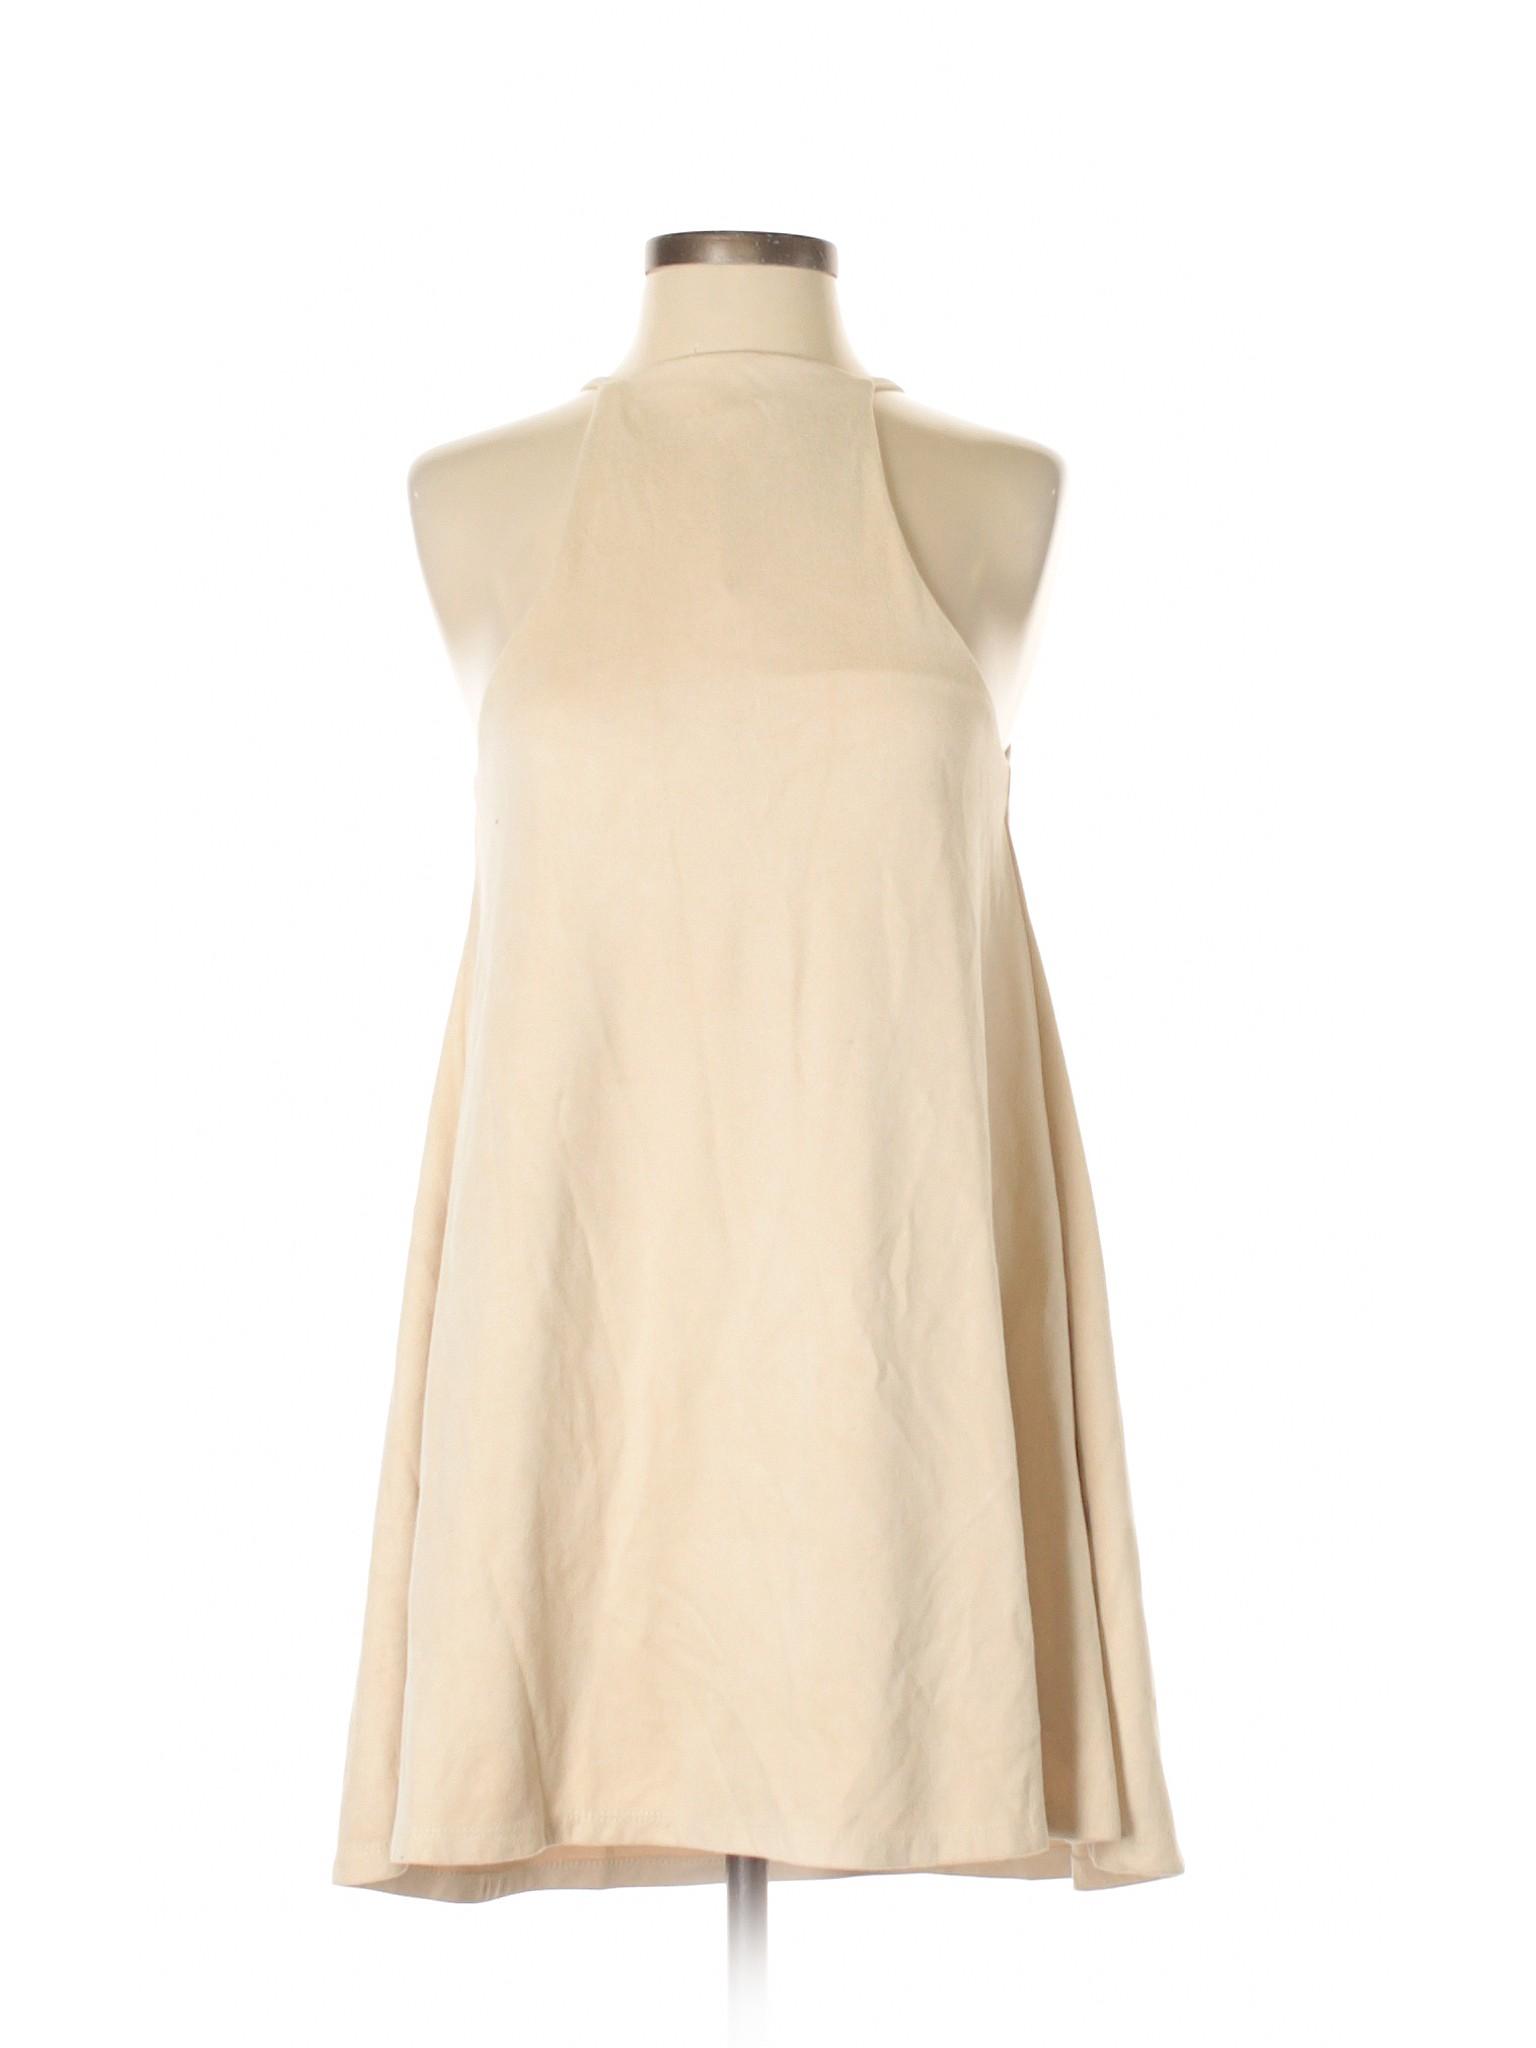 Casual Selling Selling Dress Wishlist Wishlist twwqgxvU1